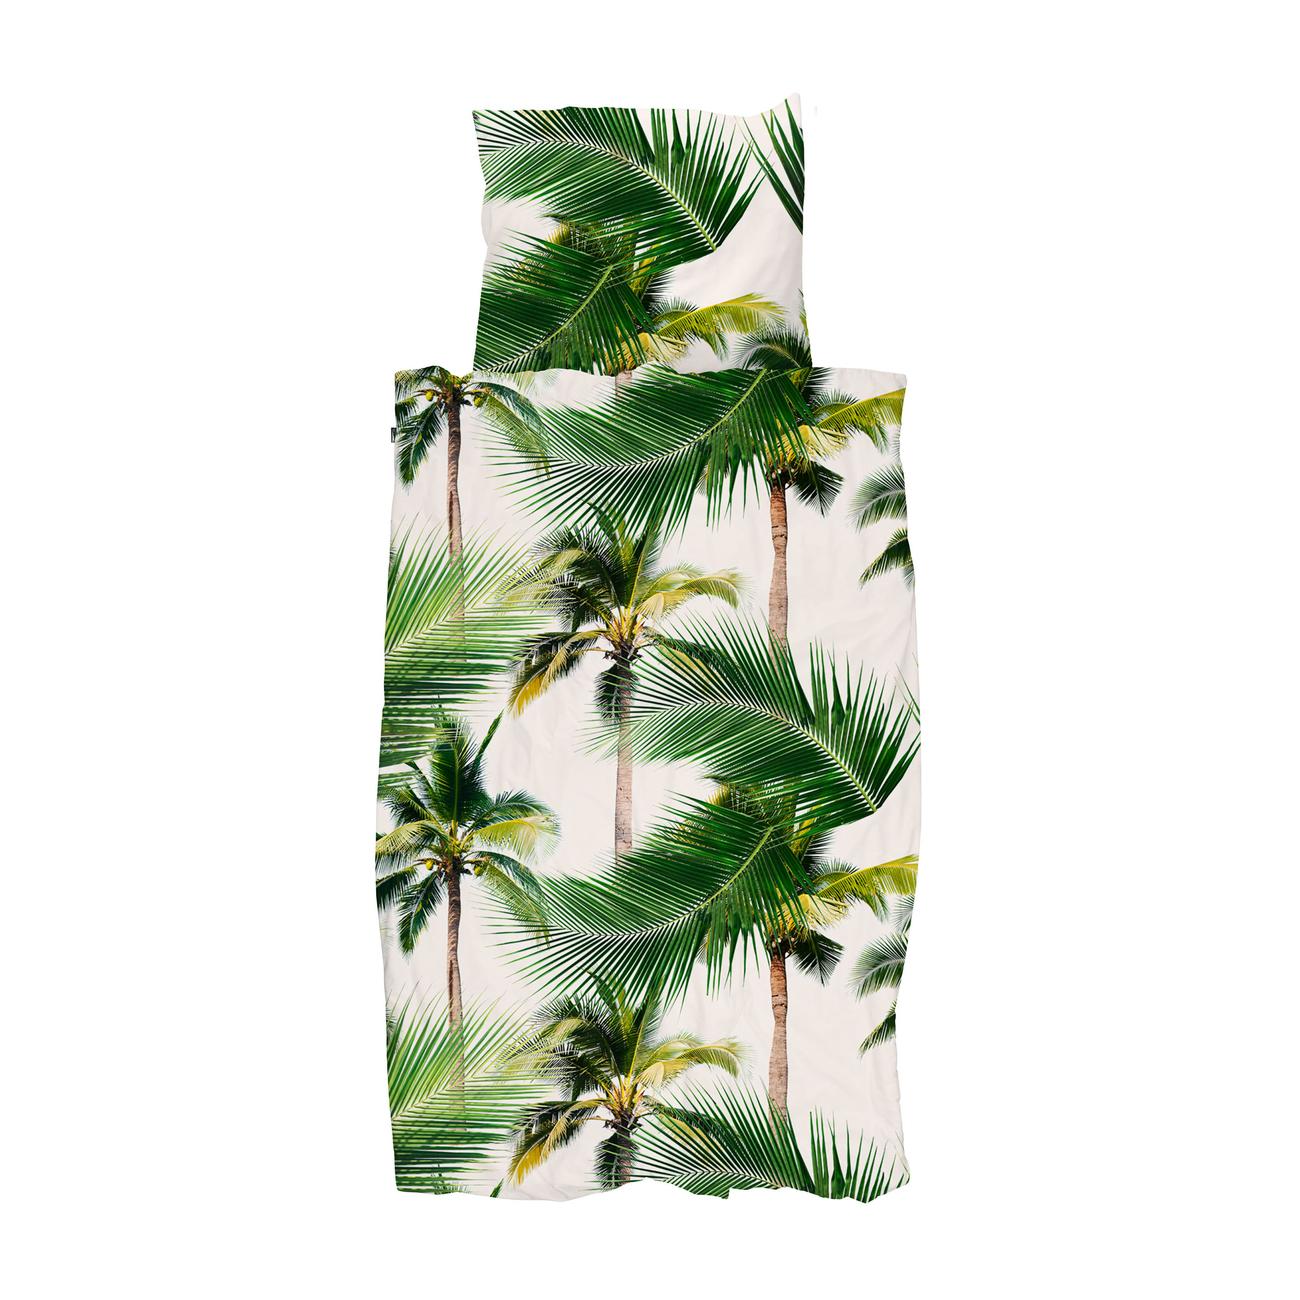 Snurk Palm Beach dekbedovertrek 140x200 220 cm